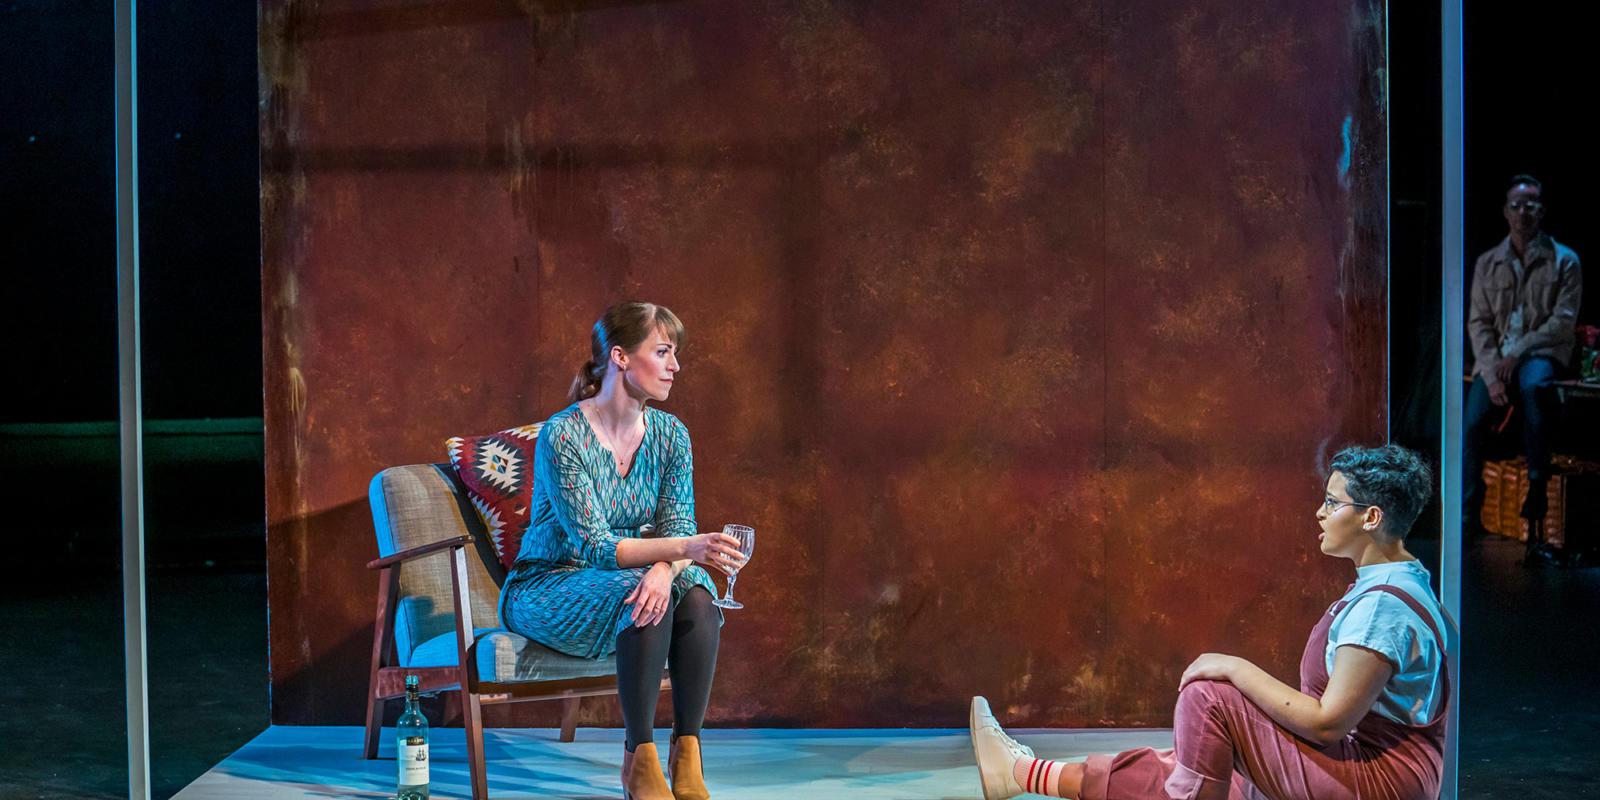 Rachael Lloyd as Dido, Eyra Norman as Belinda in Dido at the Unicorn Theatre. Photo Tristram Kenton